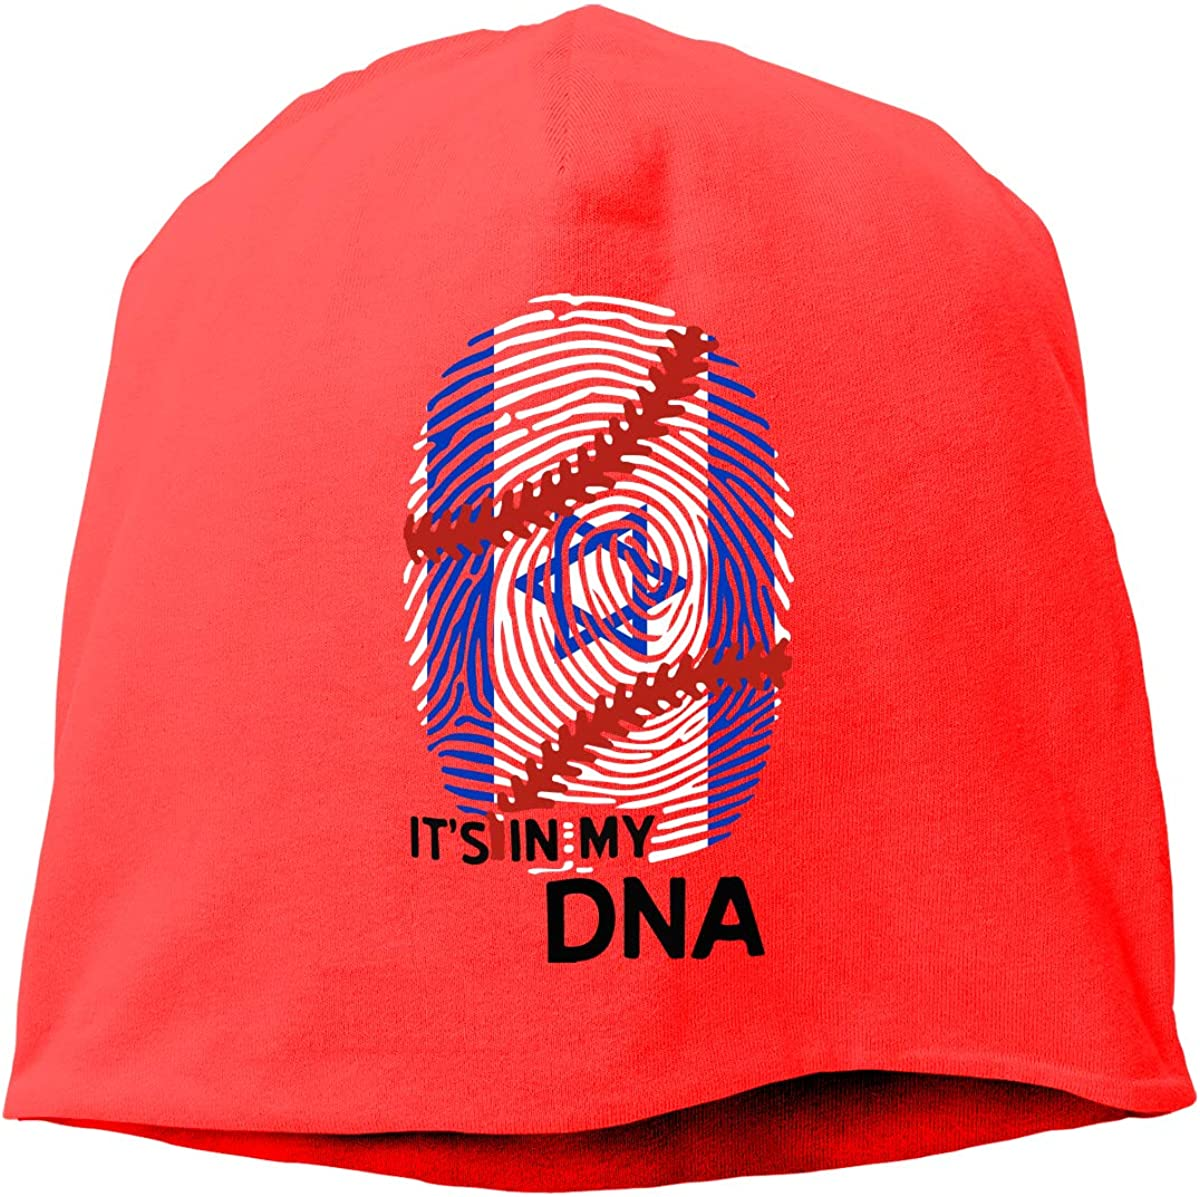 Winter Warm Knit Hat Israel Flag Baseball in My DNA Beanie Skull Cap for Women and Men